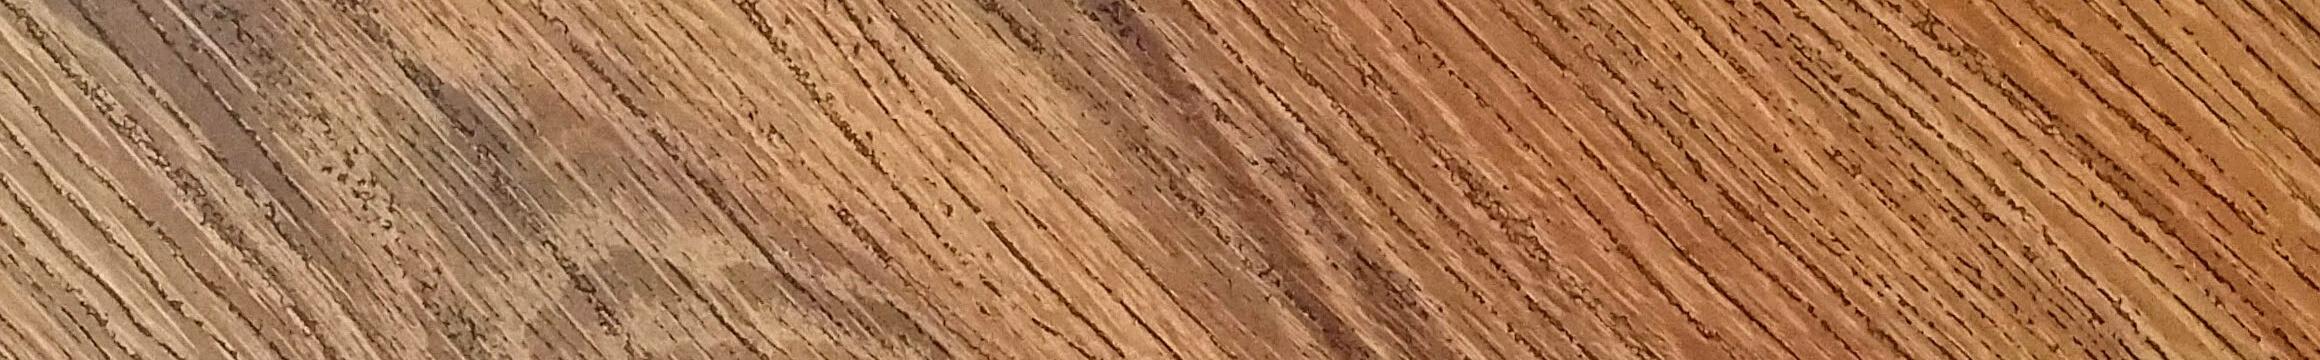 Woodgrain 03